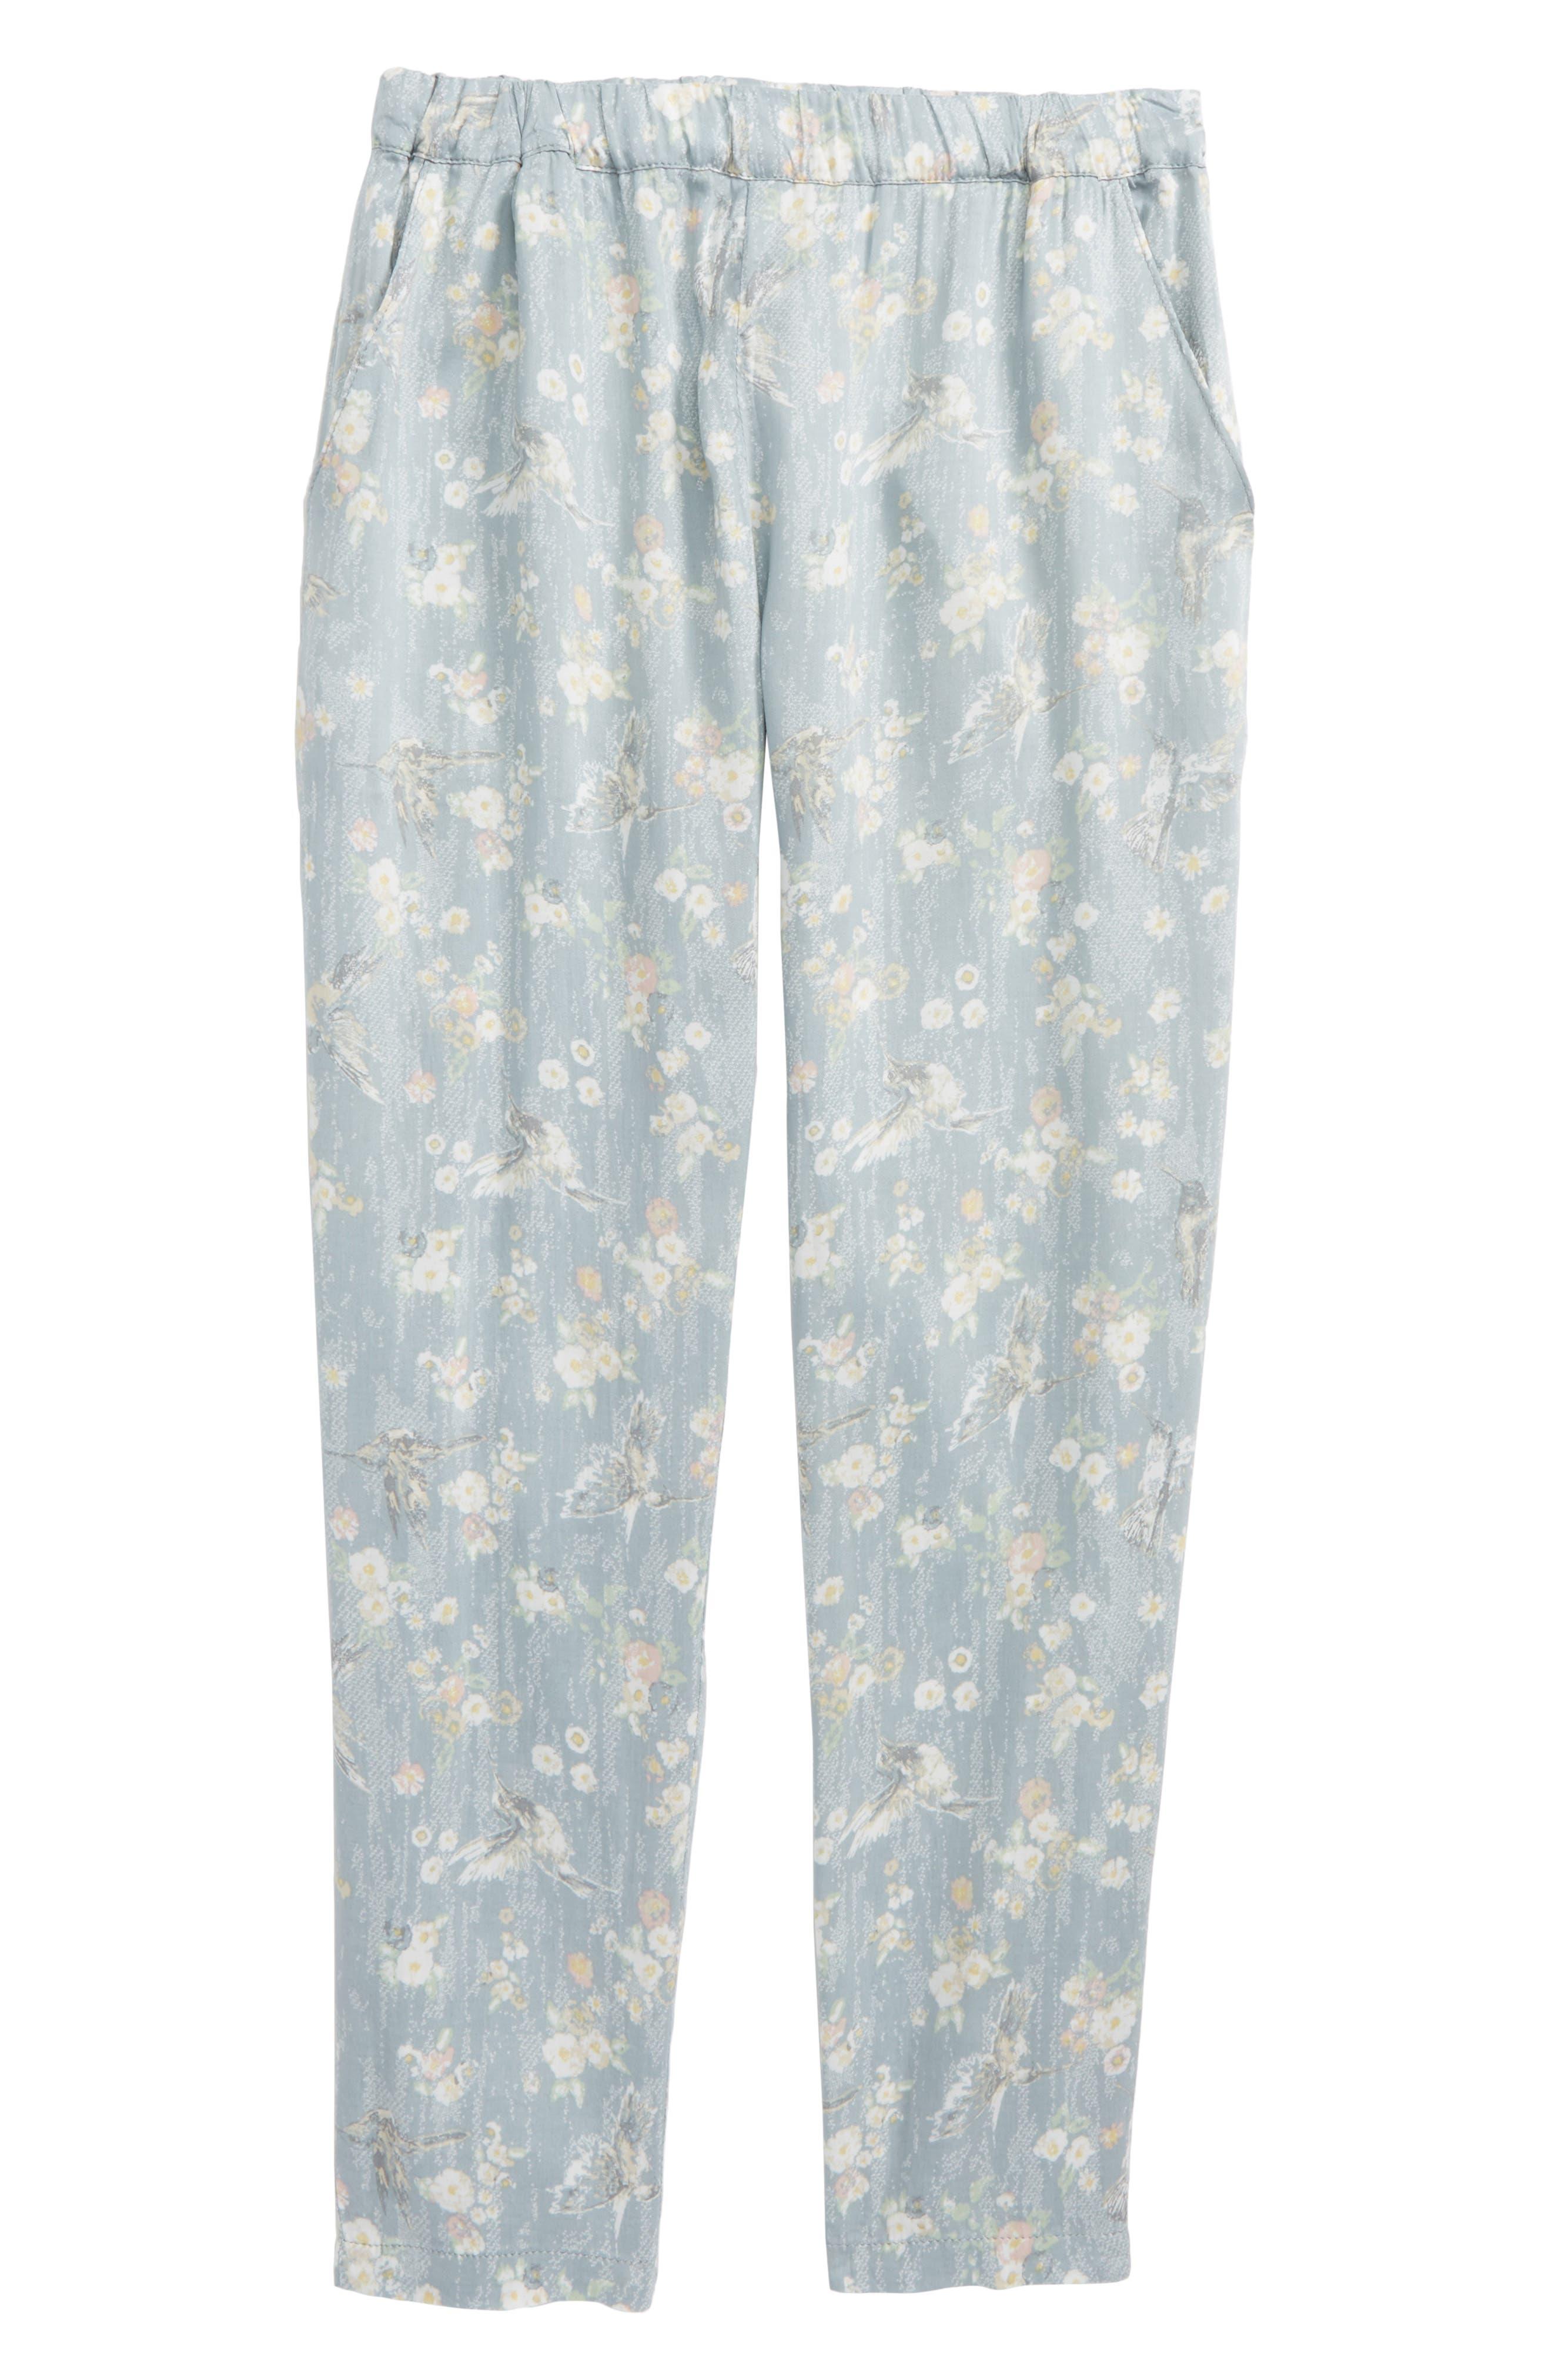 Sonia Floral Print Pants,                         Main,                         color, Sky